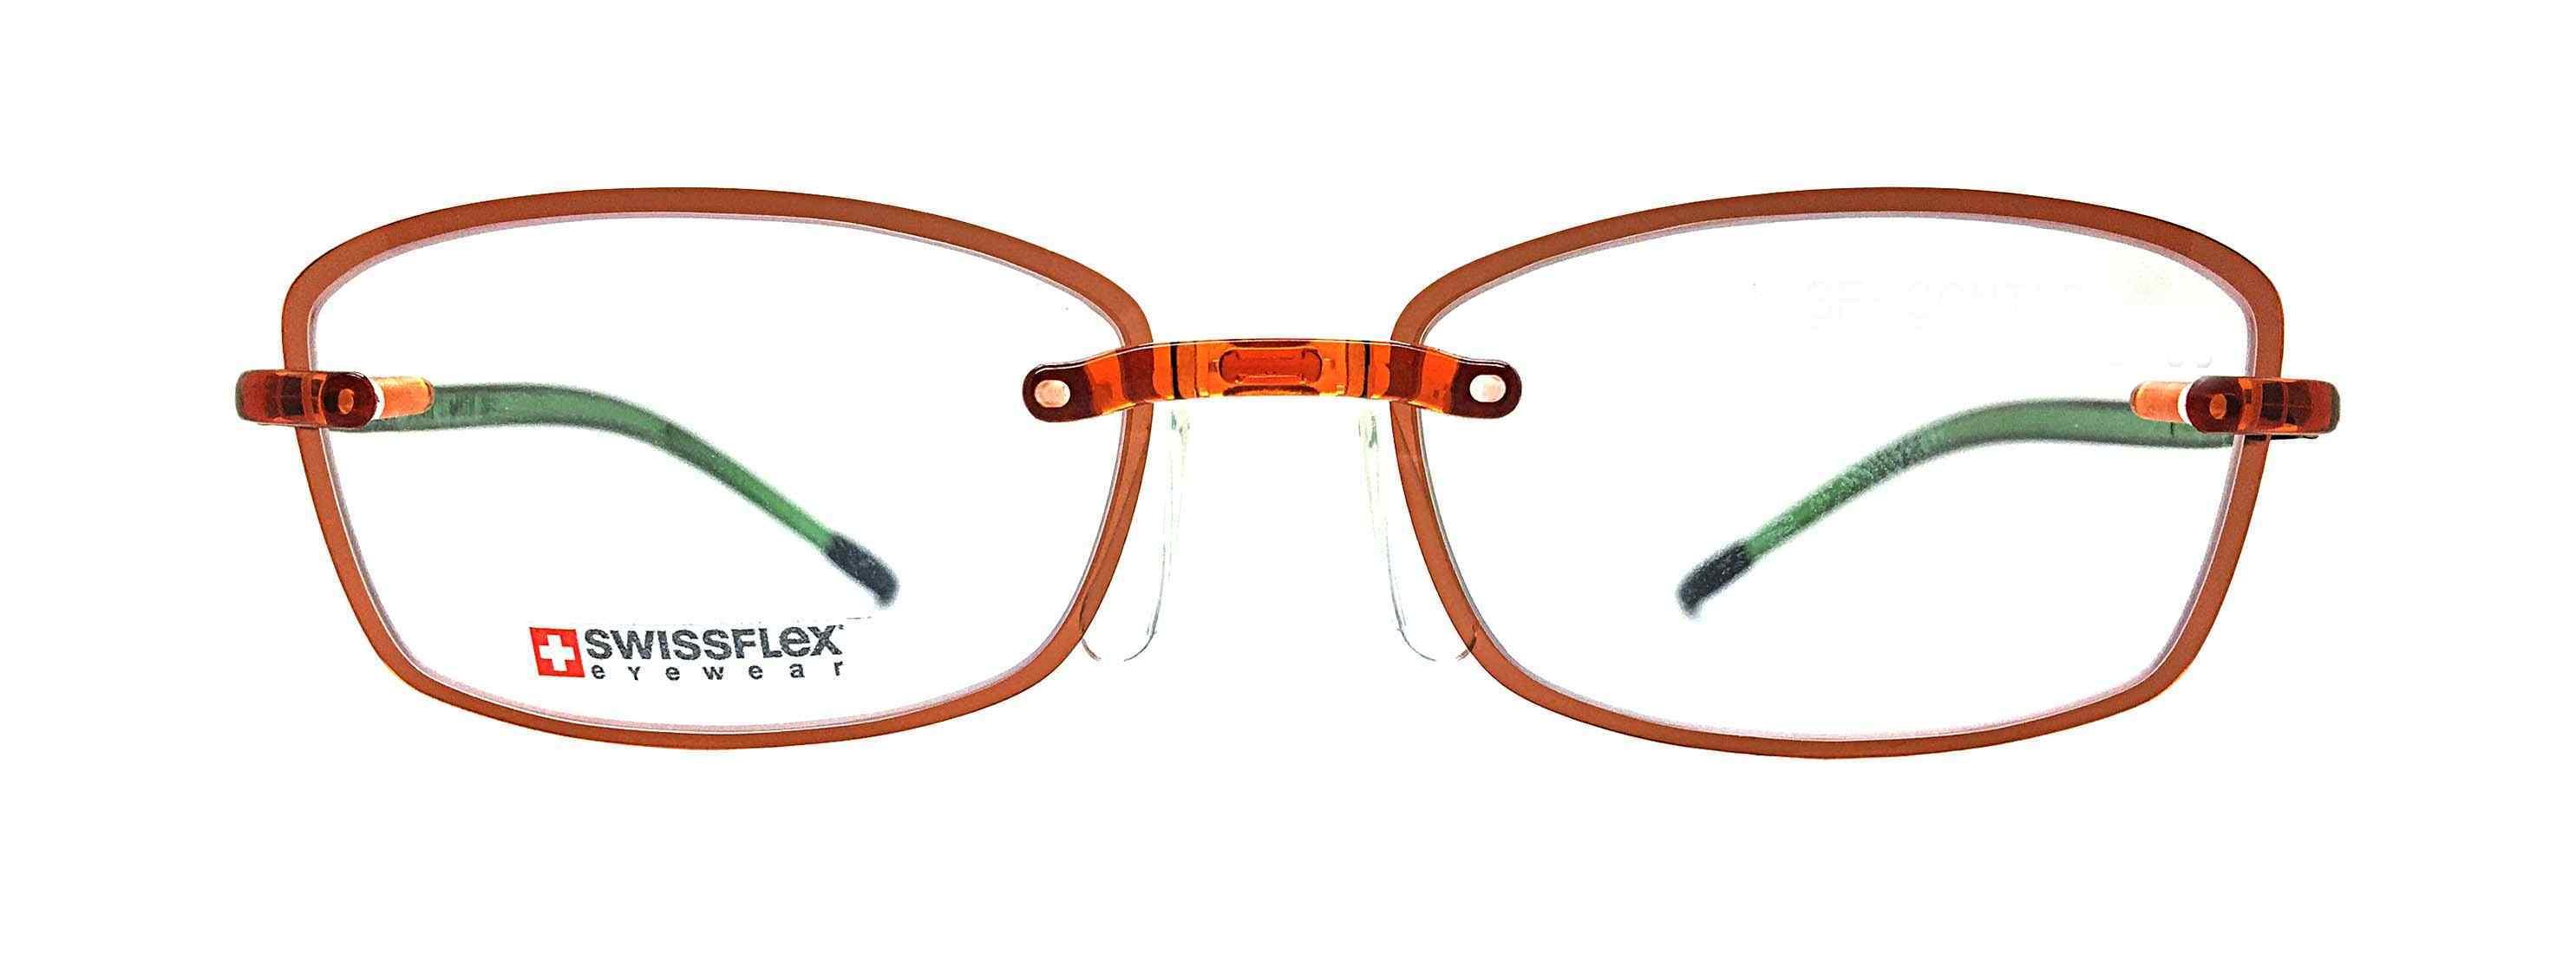 SwissFlex spectacles: SwissFlex Contur 206 53 1 2970x1100